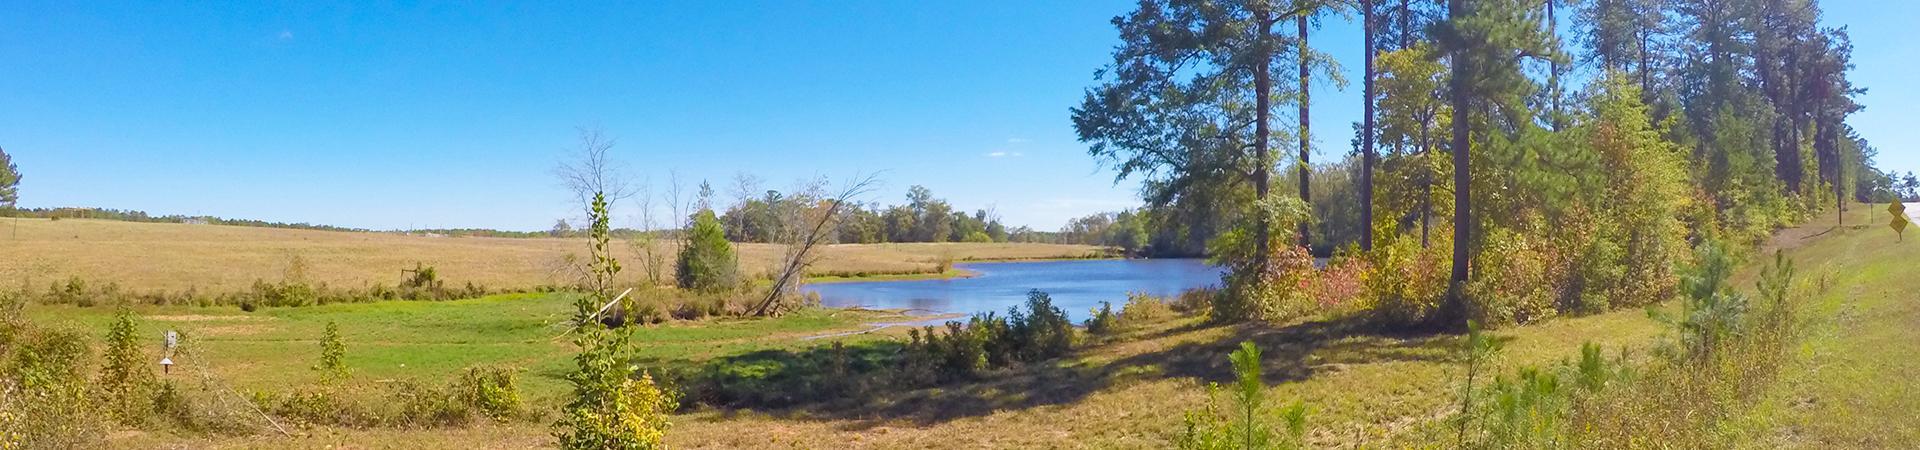 pond at B.F. Grant Wildlife Management Area